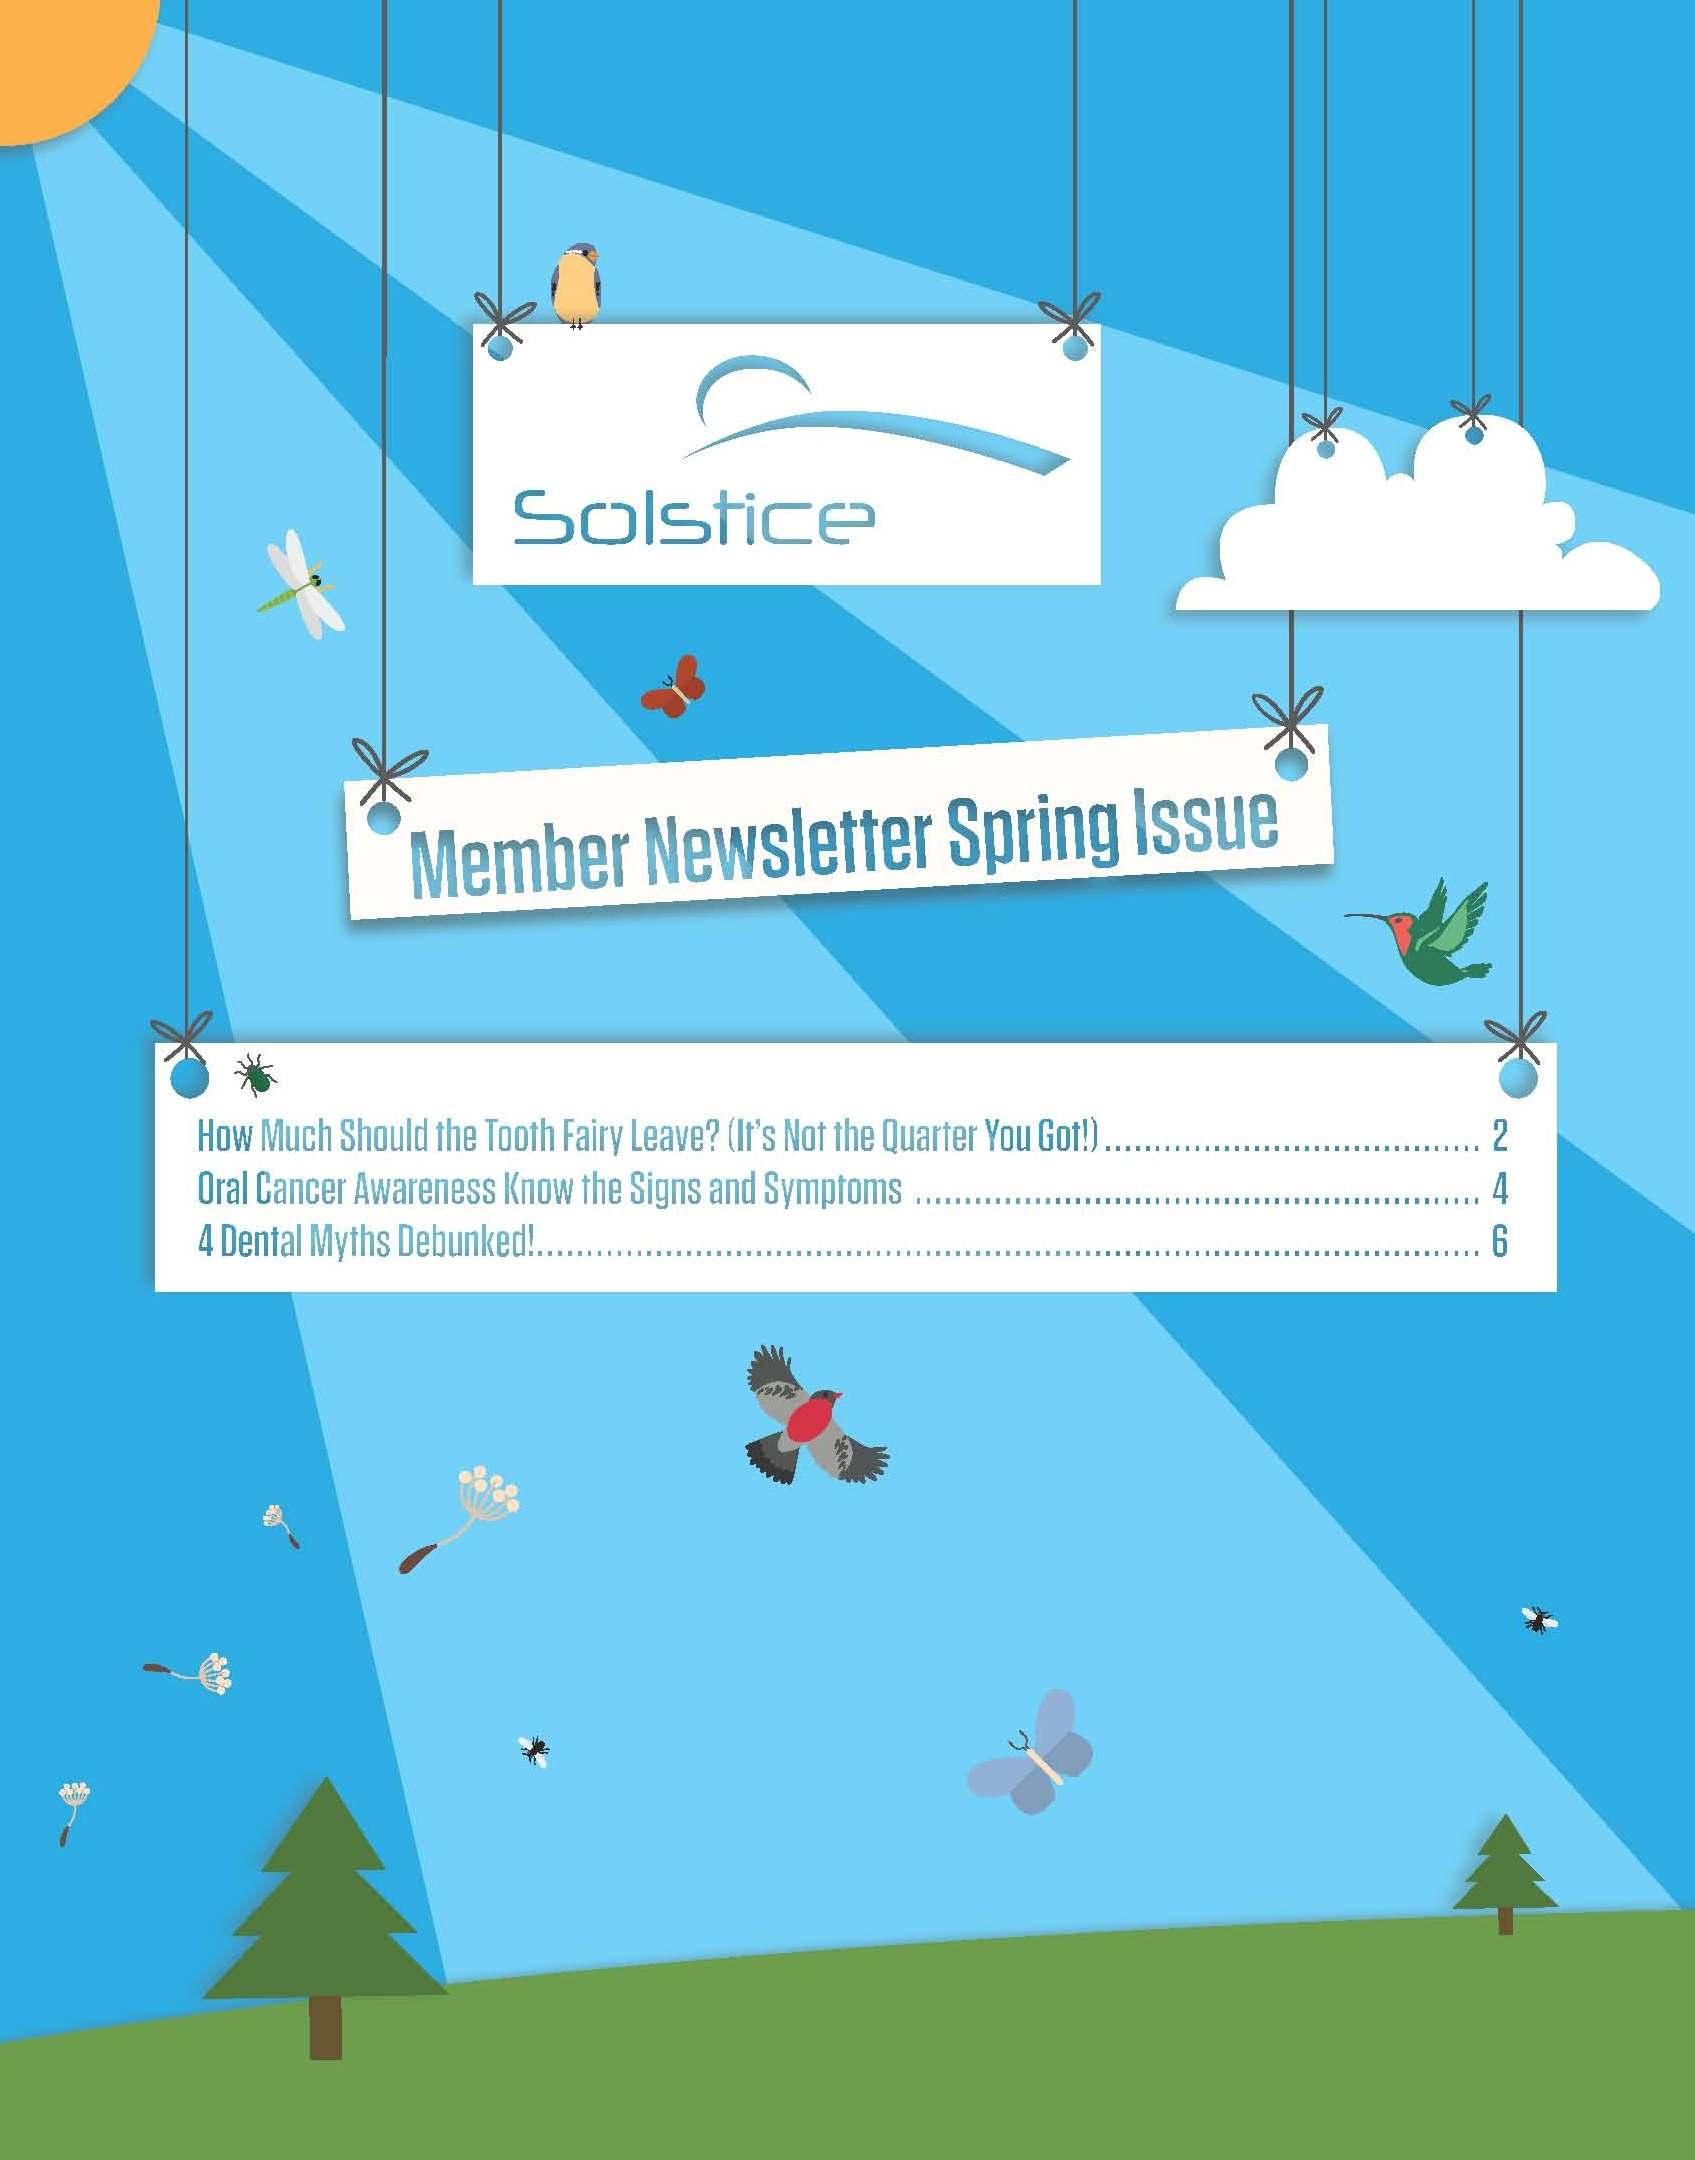 Member_Newsletter_2014_Spring_Issue_Solstice